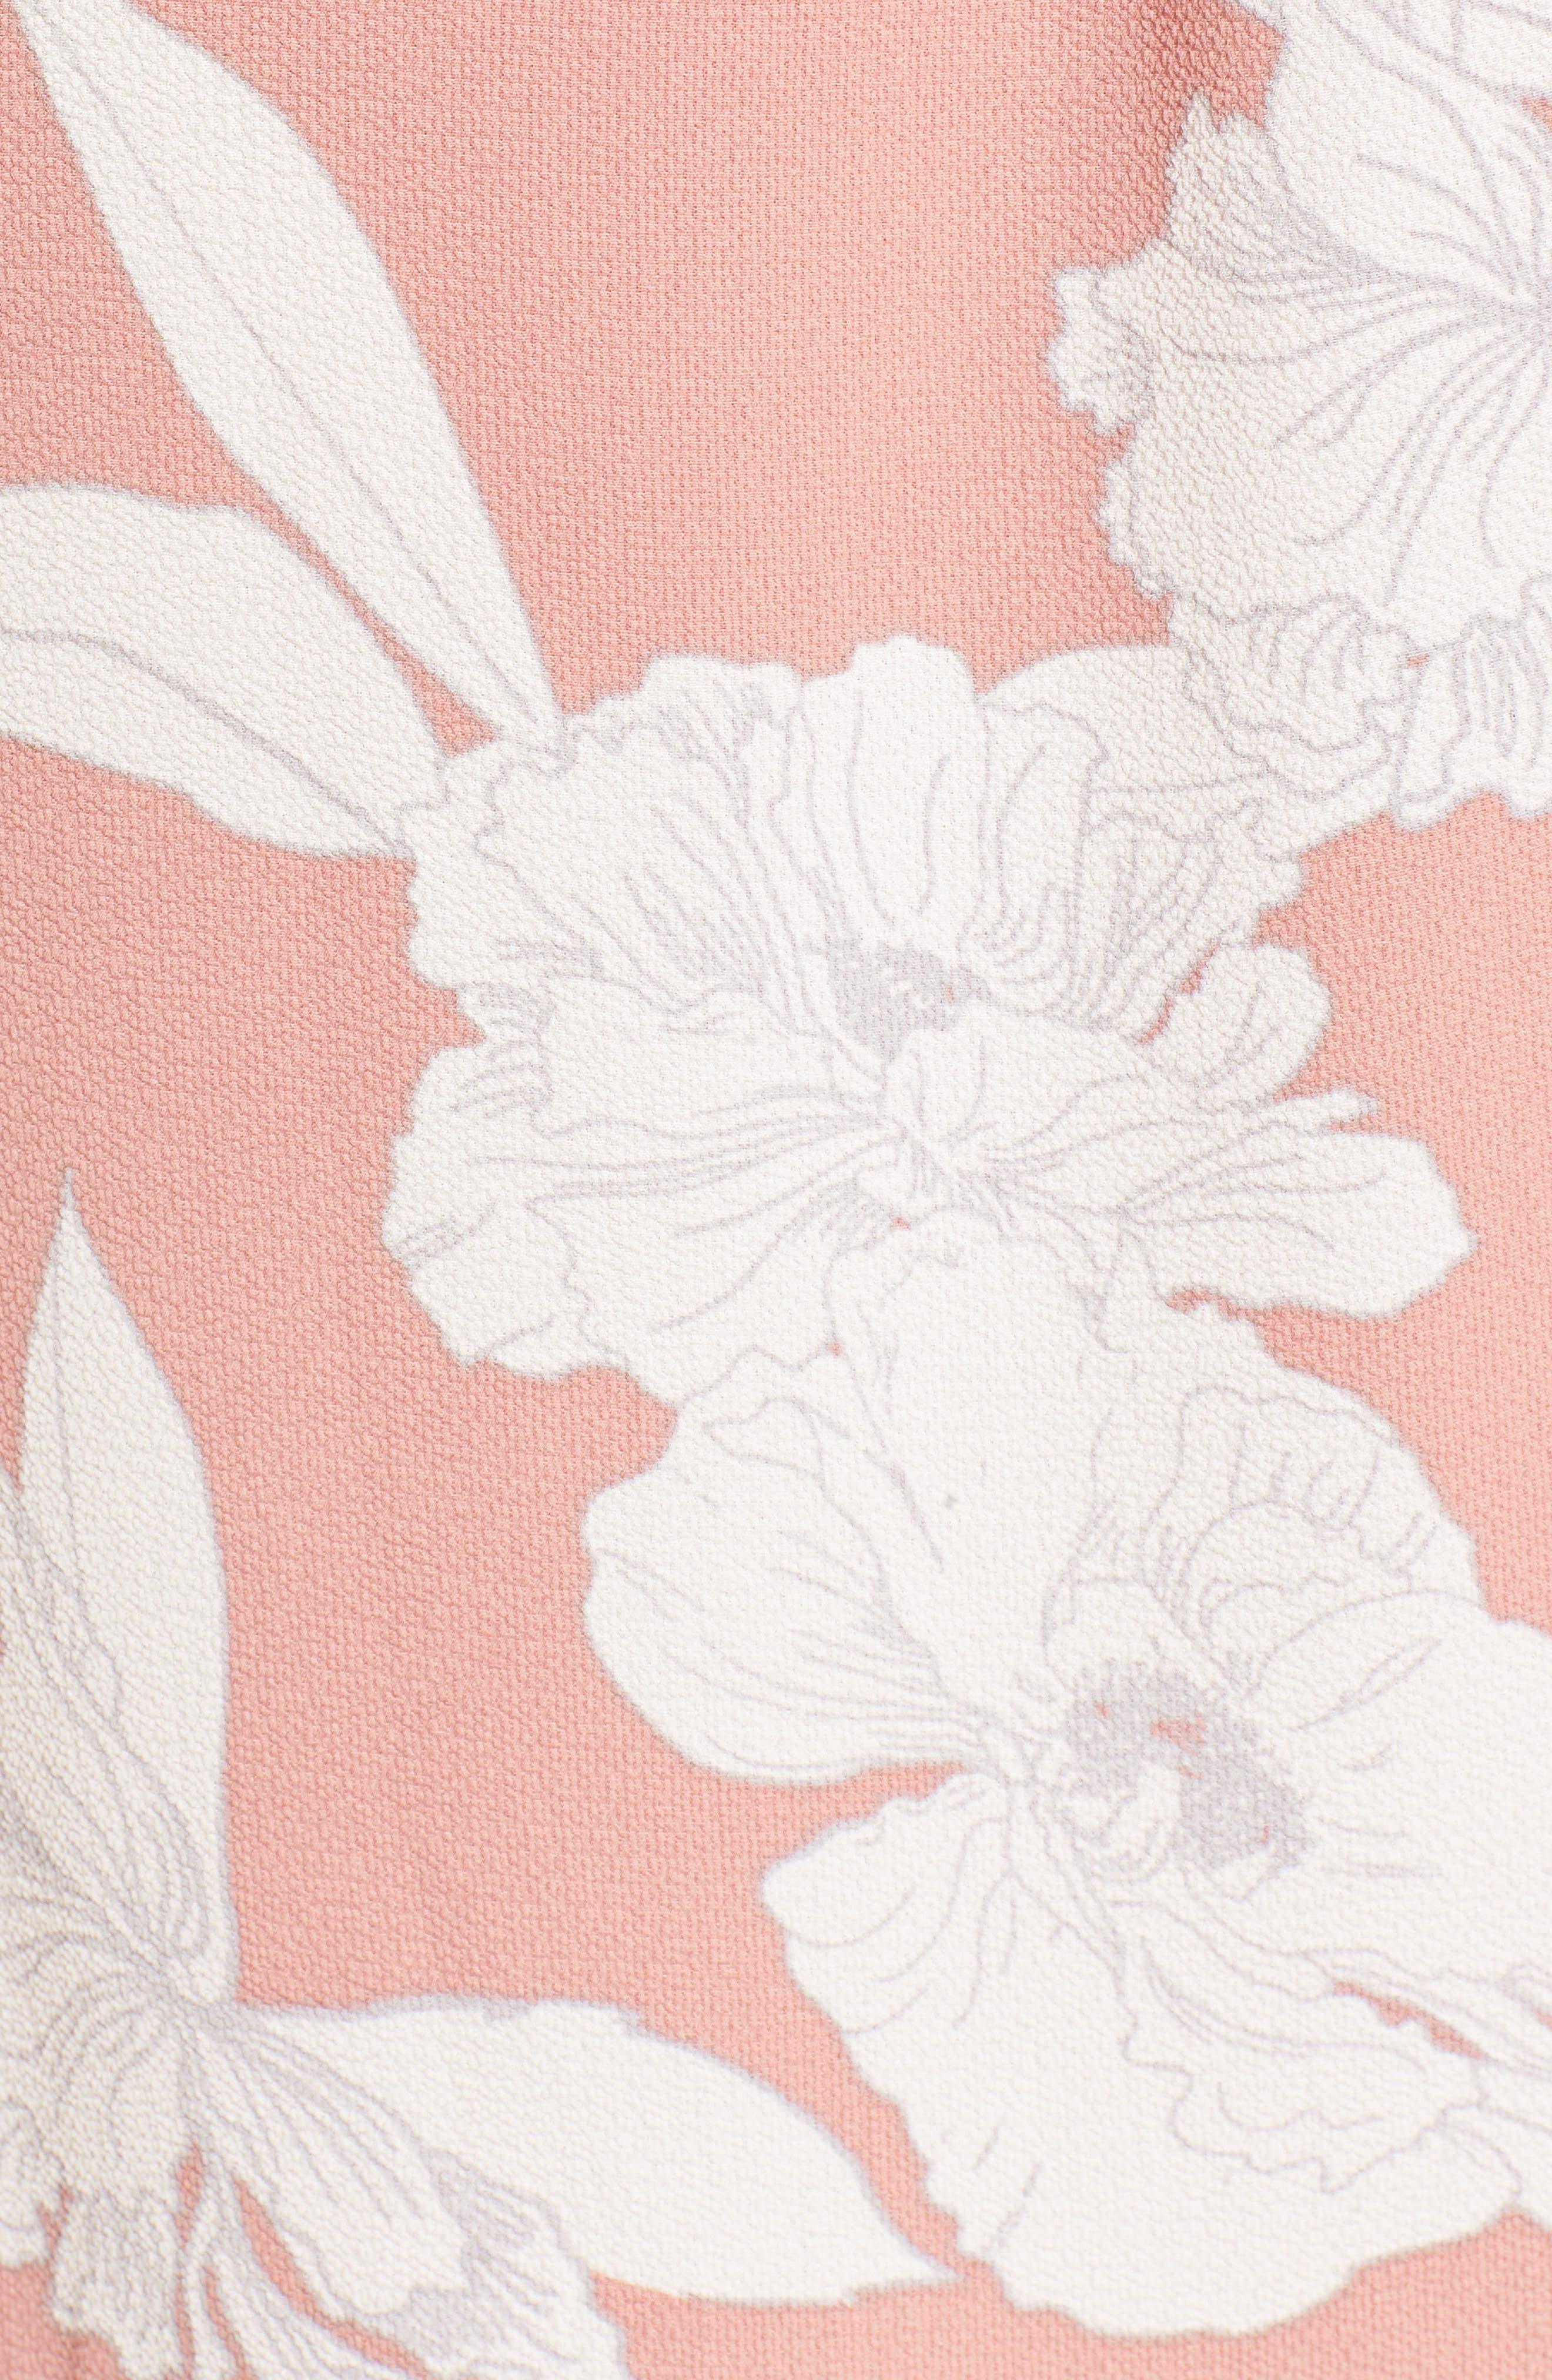 Ruffle Wrap Dress,                             Alternate thumbnail 5, color,                             Blush/ Ivory